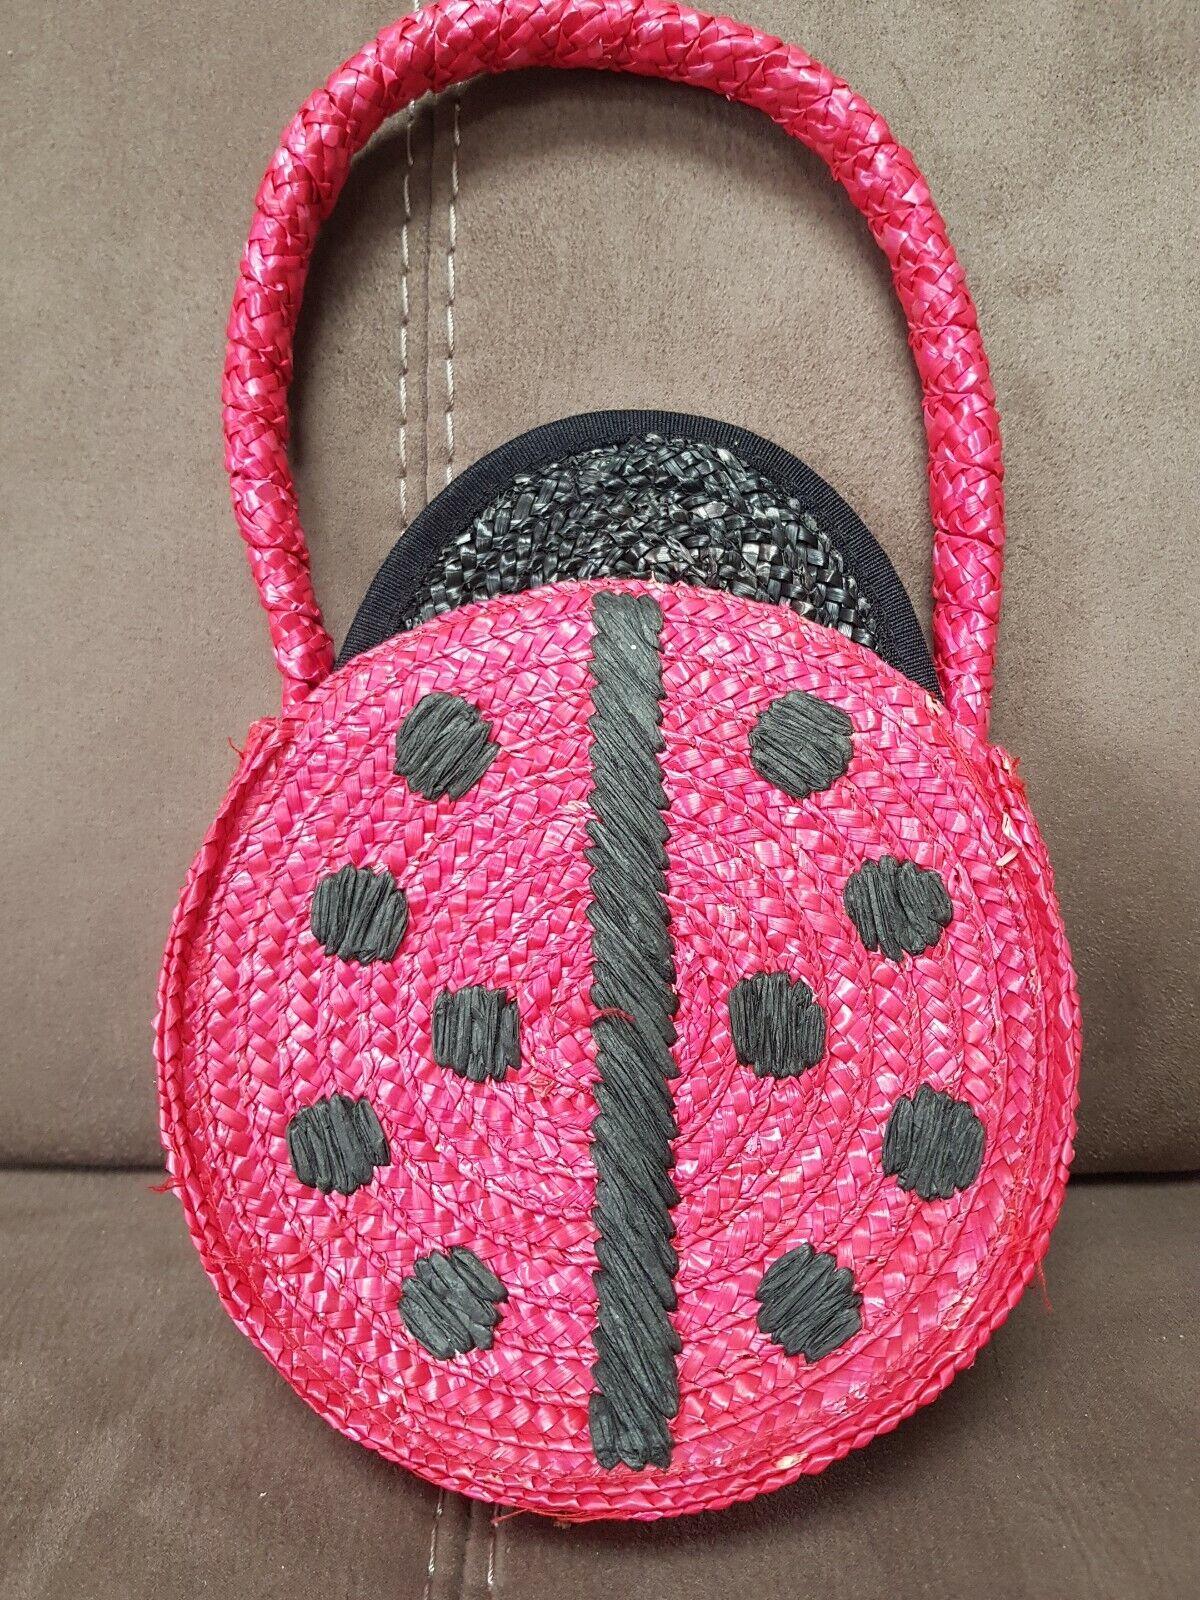 New Next Ladybird Handbag